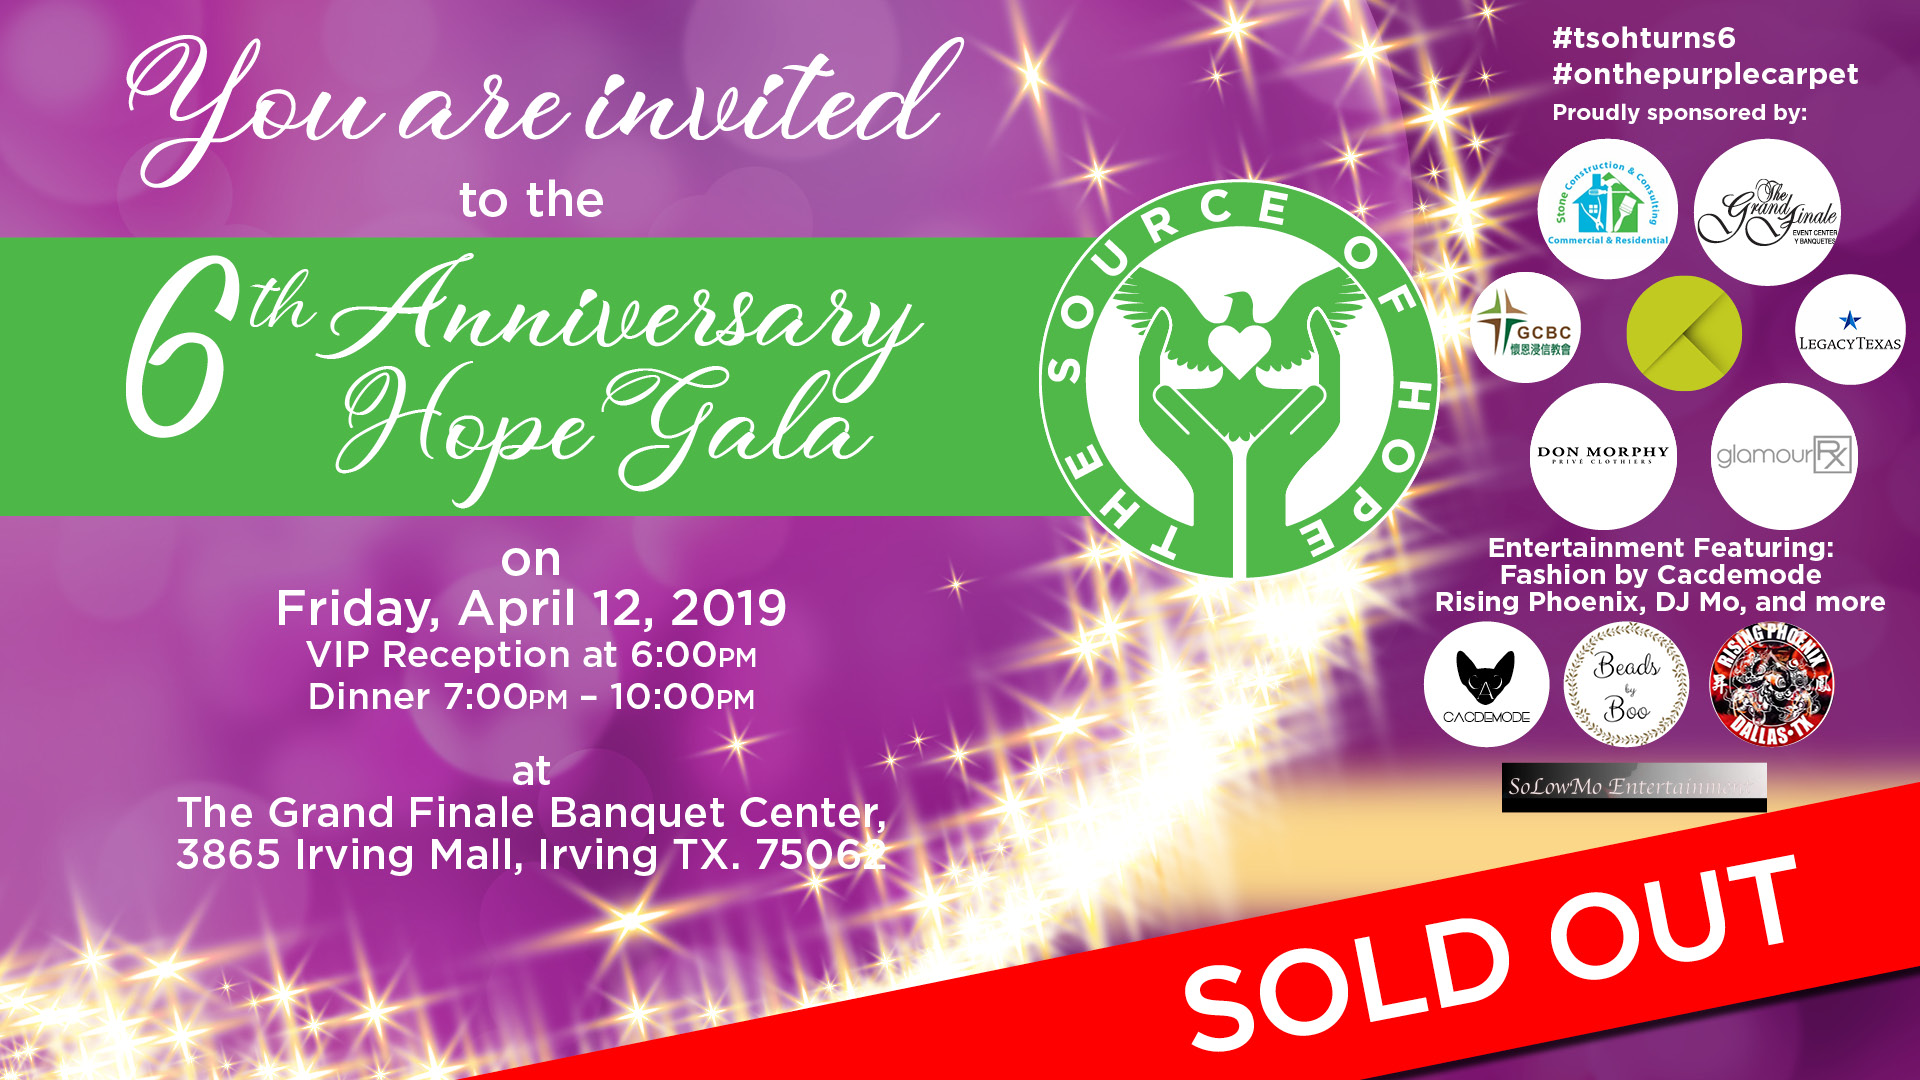 APRIL-anniversary invite SOLDOUT.jpg